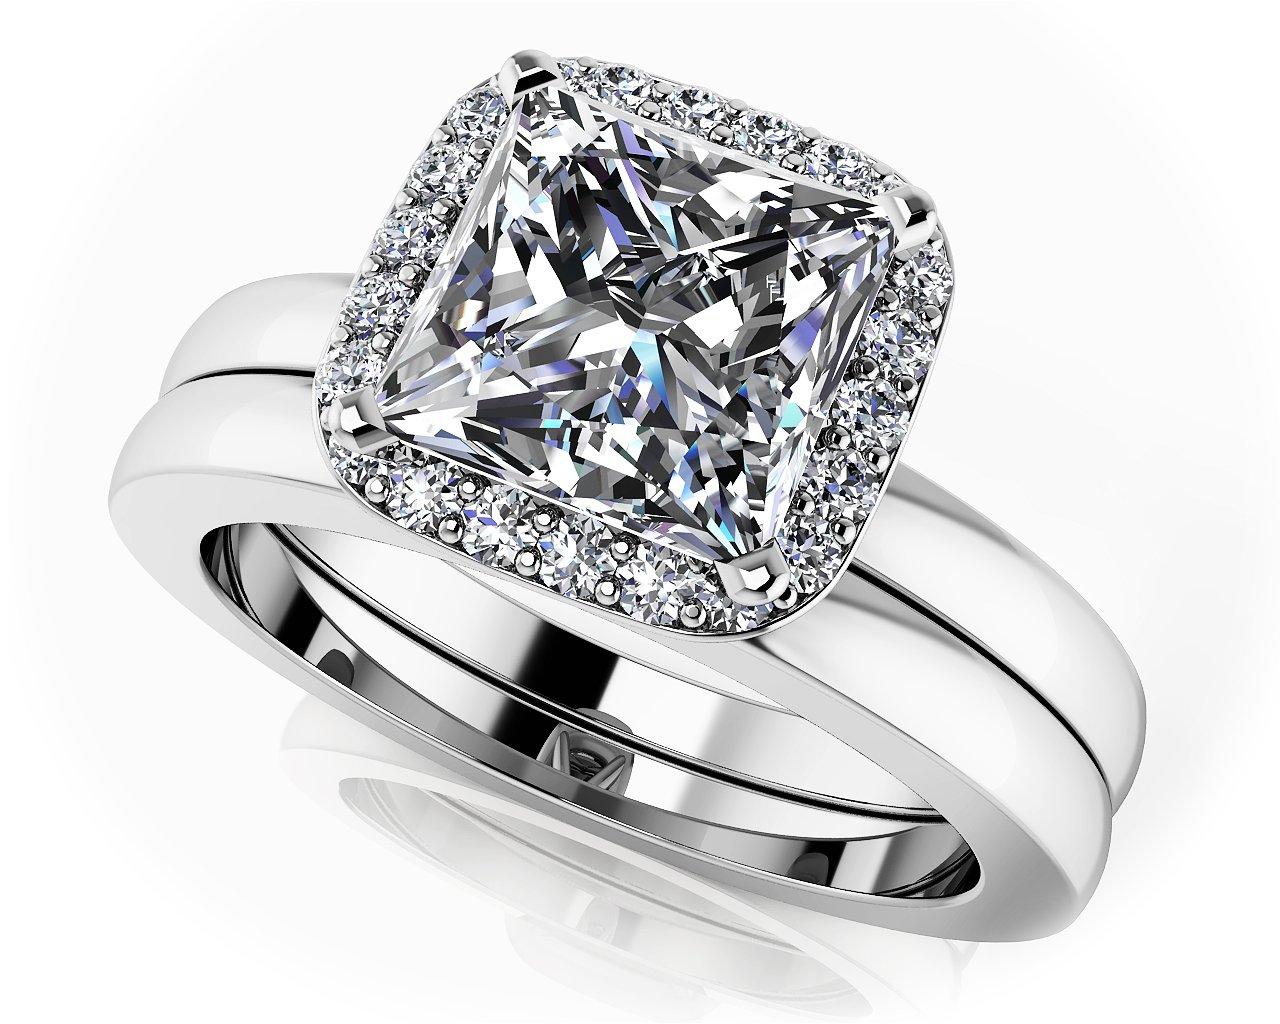 GIA Certified 14K White Gold (HallMarked) Perfect Halo Princess Cut Bridal Set Size - 6